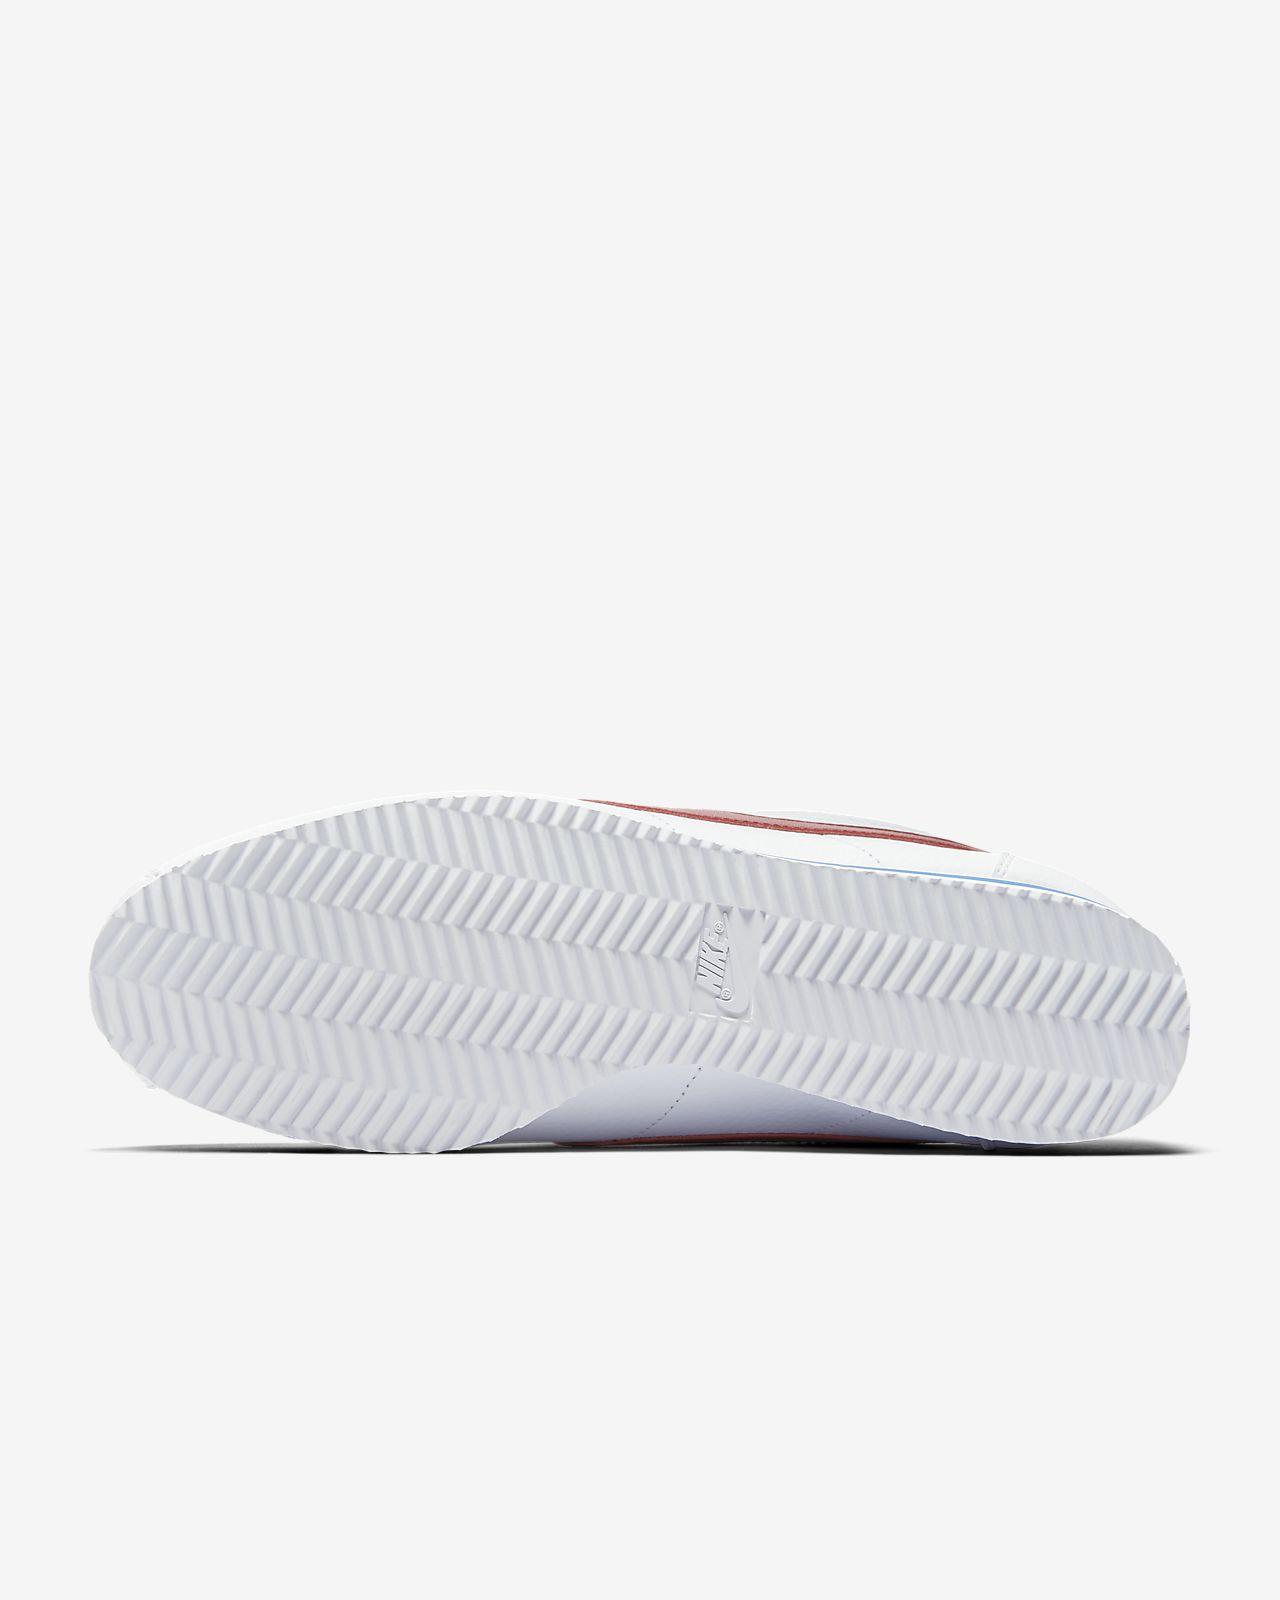 the best attitude e6ae5 d553f Chaussure Nike Classic Cortez pour Homme. Nike.com FR